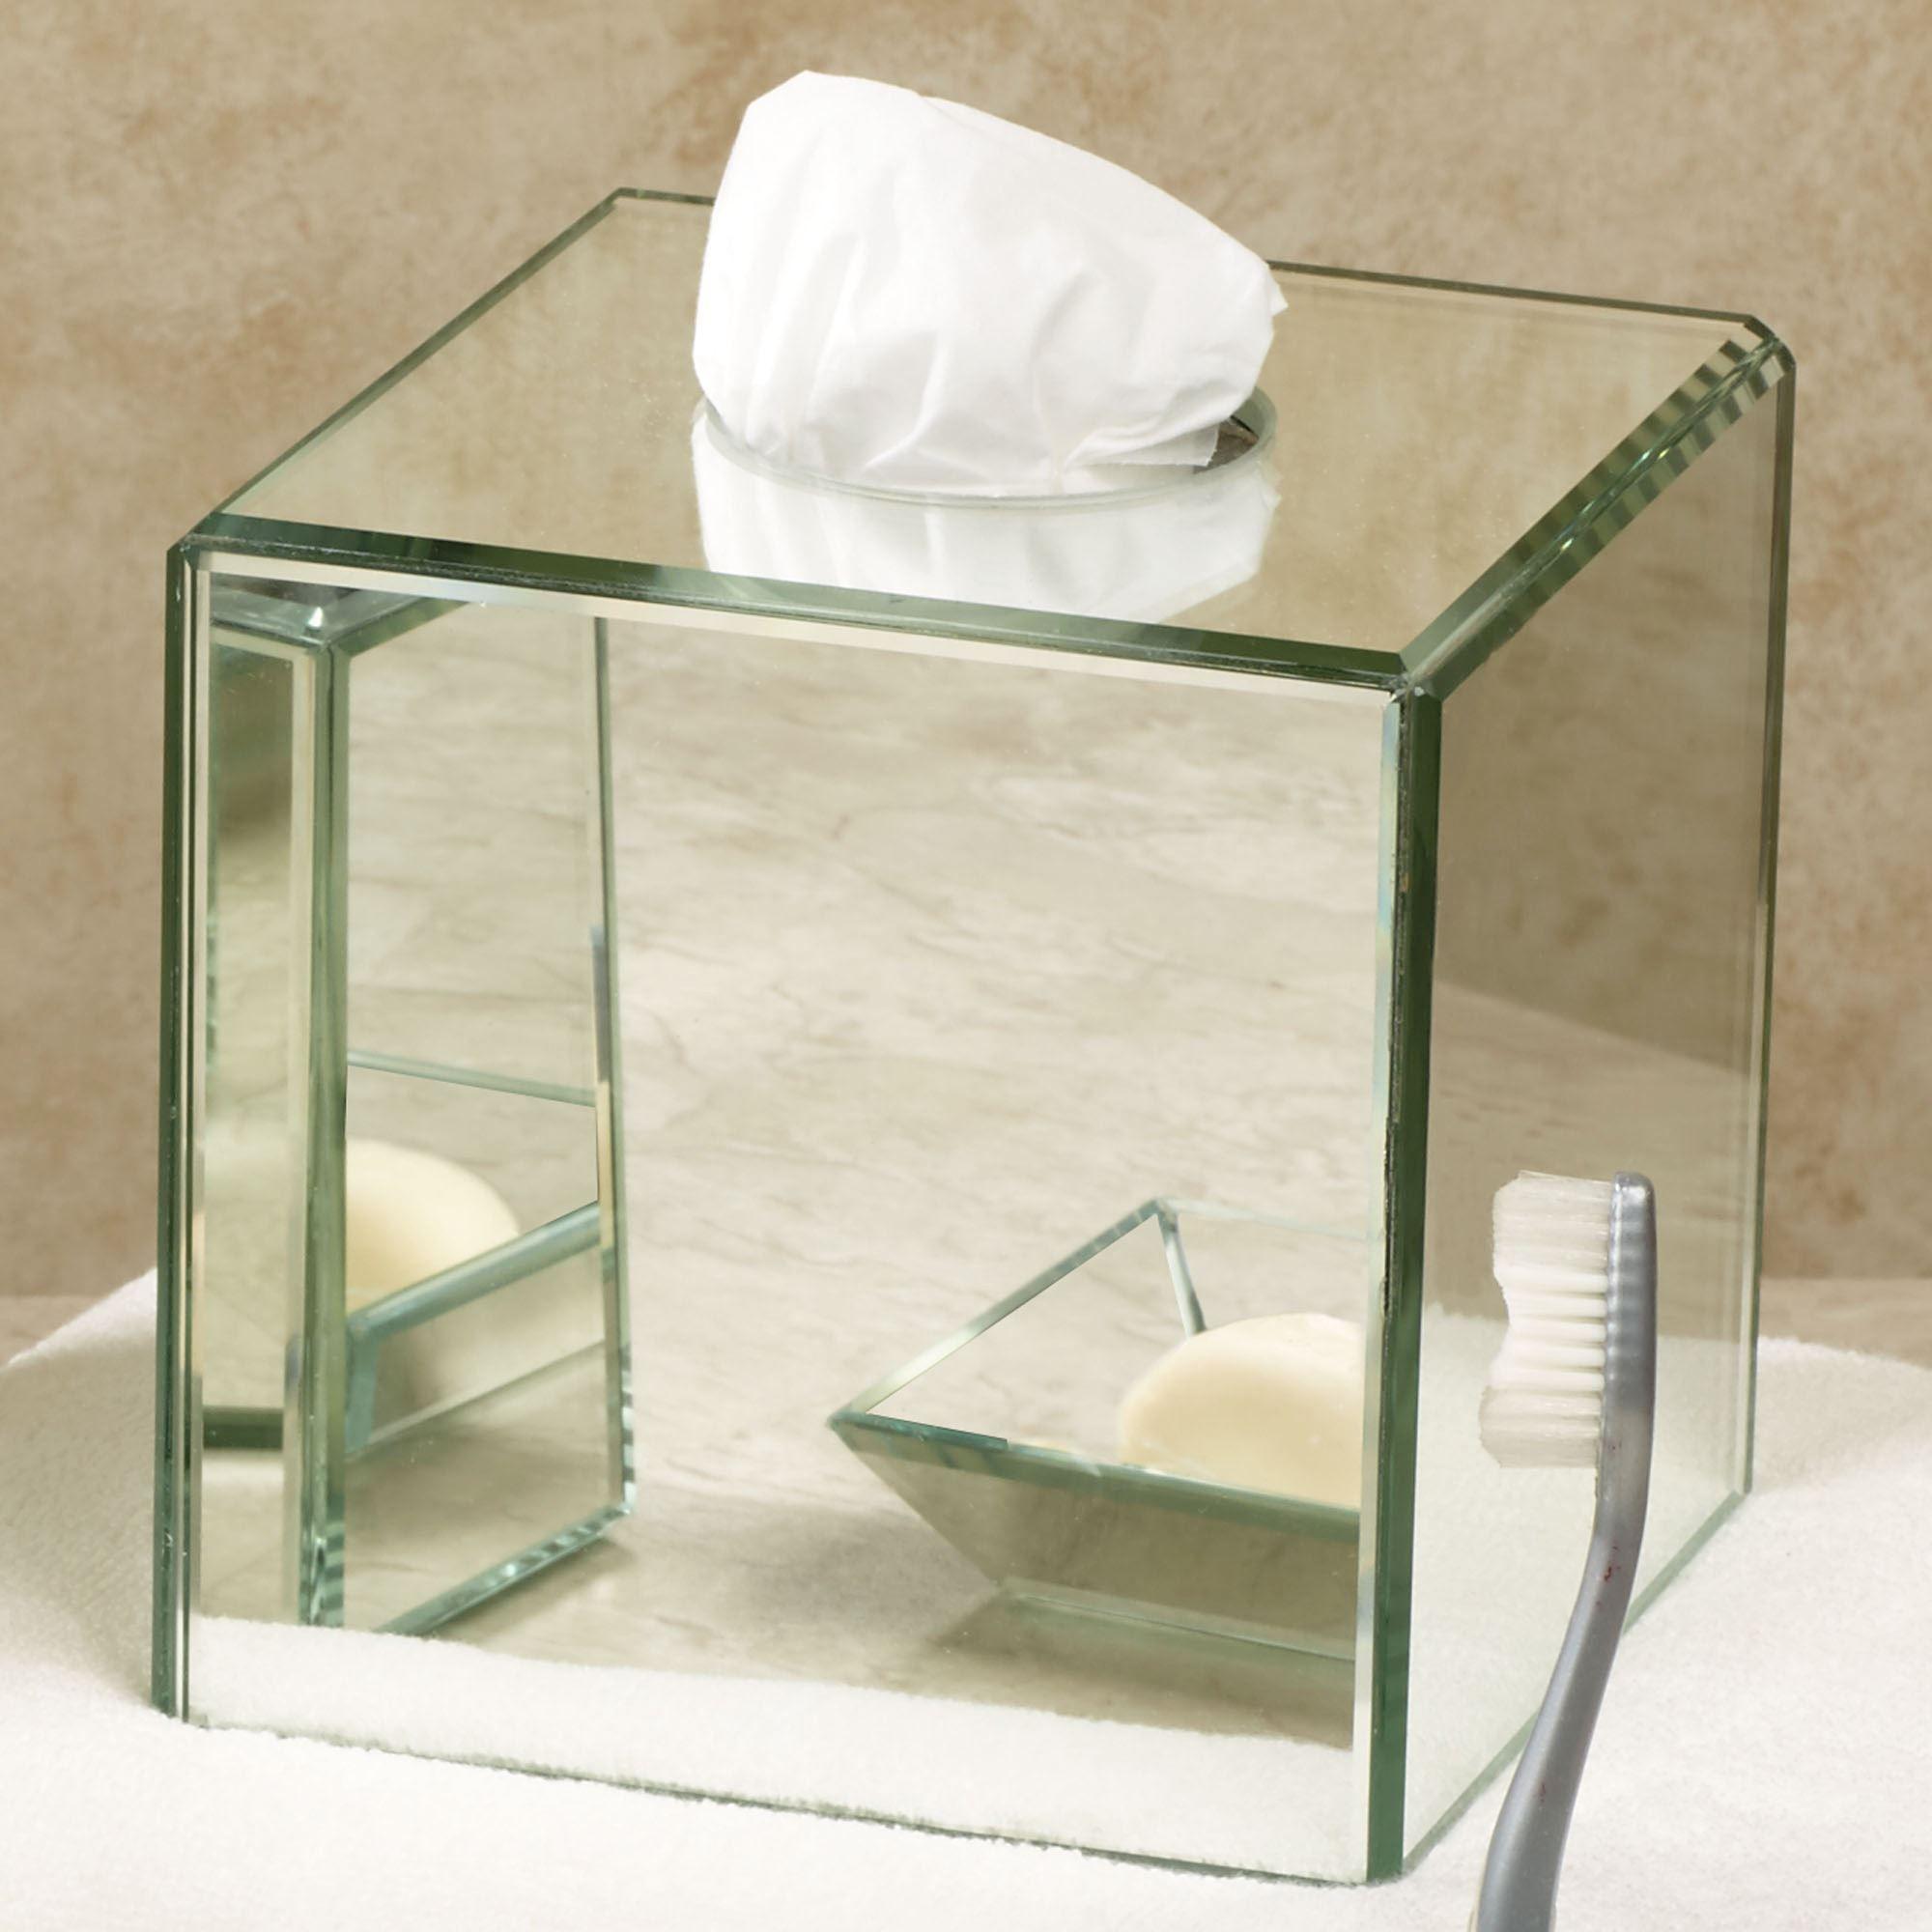 Crystal mirror bath accessories for Mirrored bathroom accessories sets